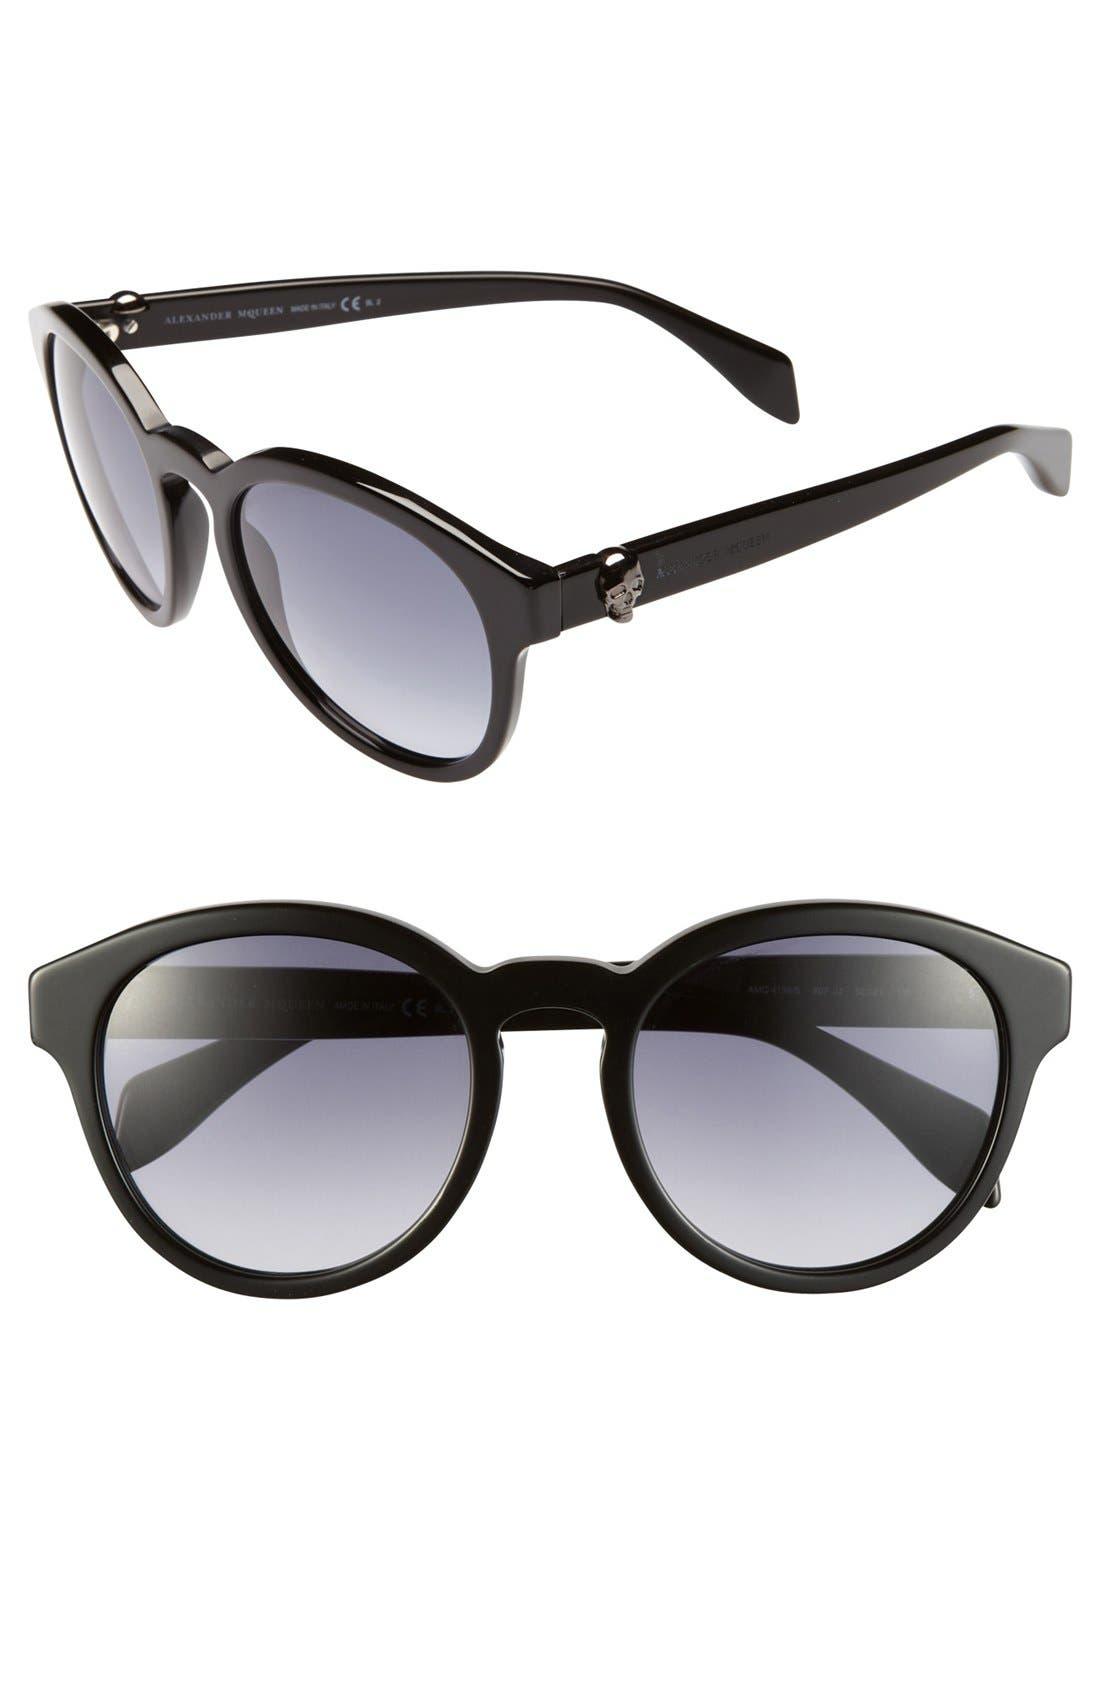 Main Image - Alexander McQueen 52mm Sunglasses